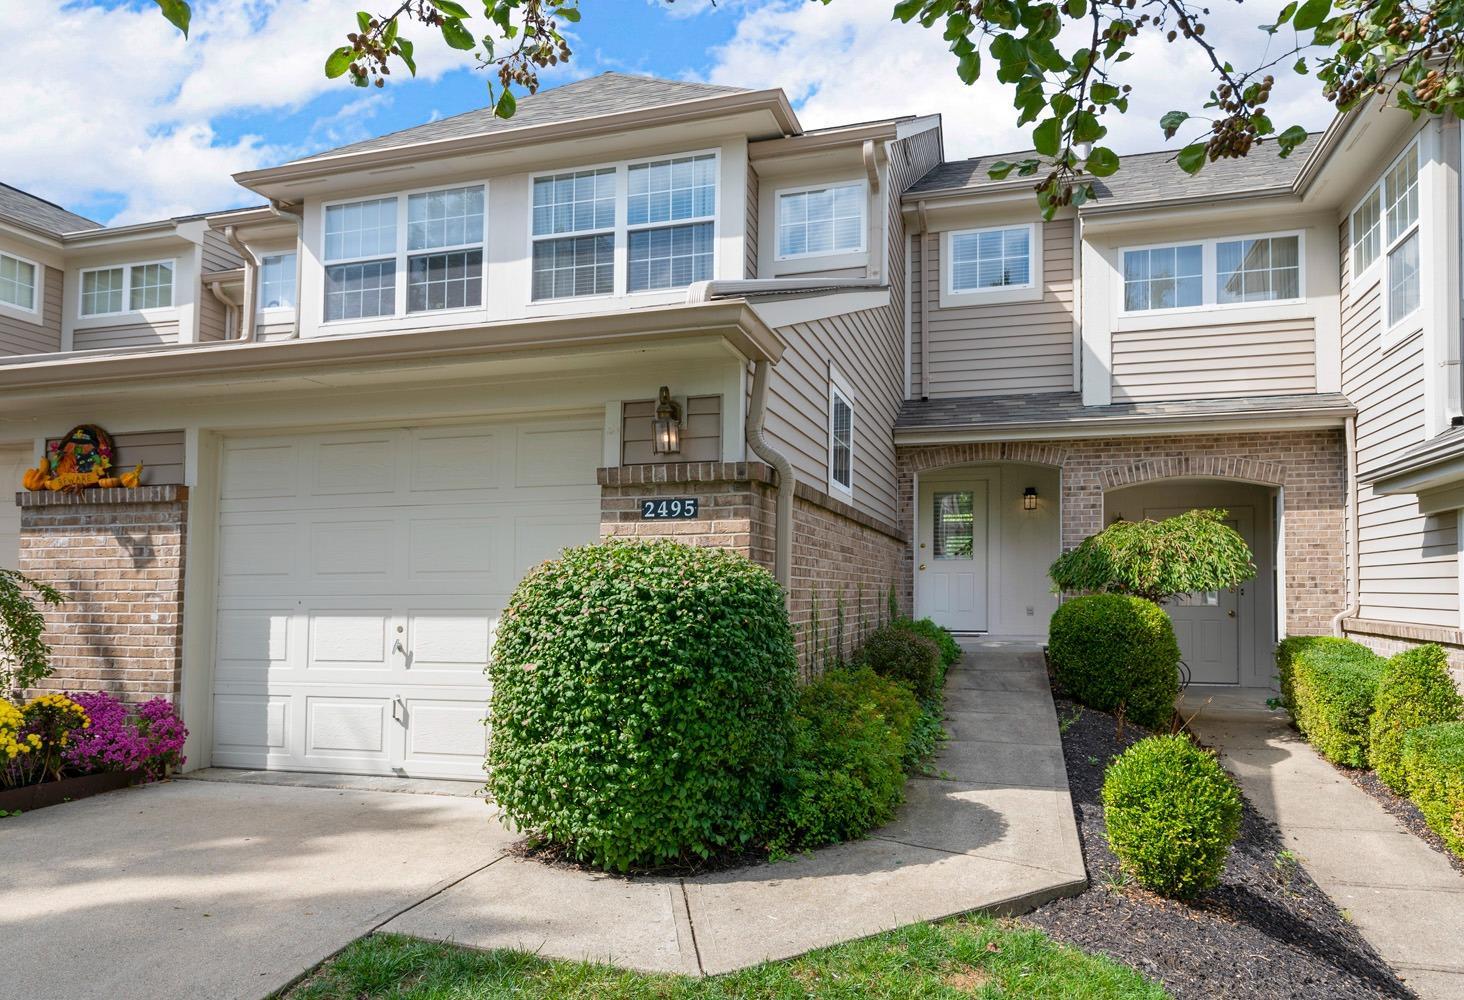 2495 Walnutview Court, Cincinnati, Ohio 45230, 3 Bedrooms Bedrooms, 7 Rooms Rooms,3 BathroomsBathrooms,Condominium,For Sale,Walnutview,1717827